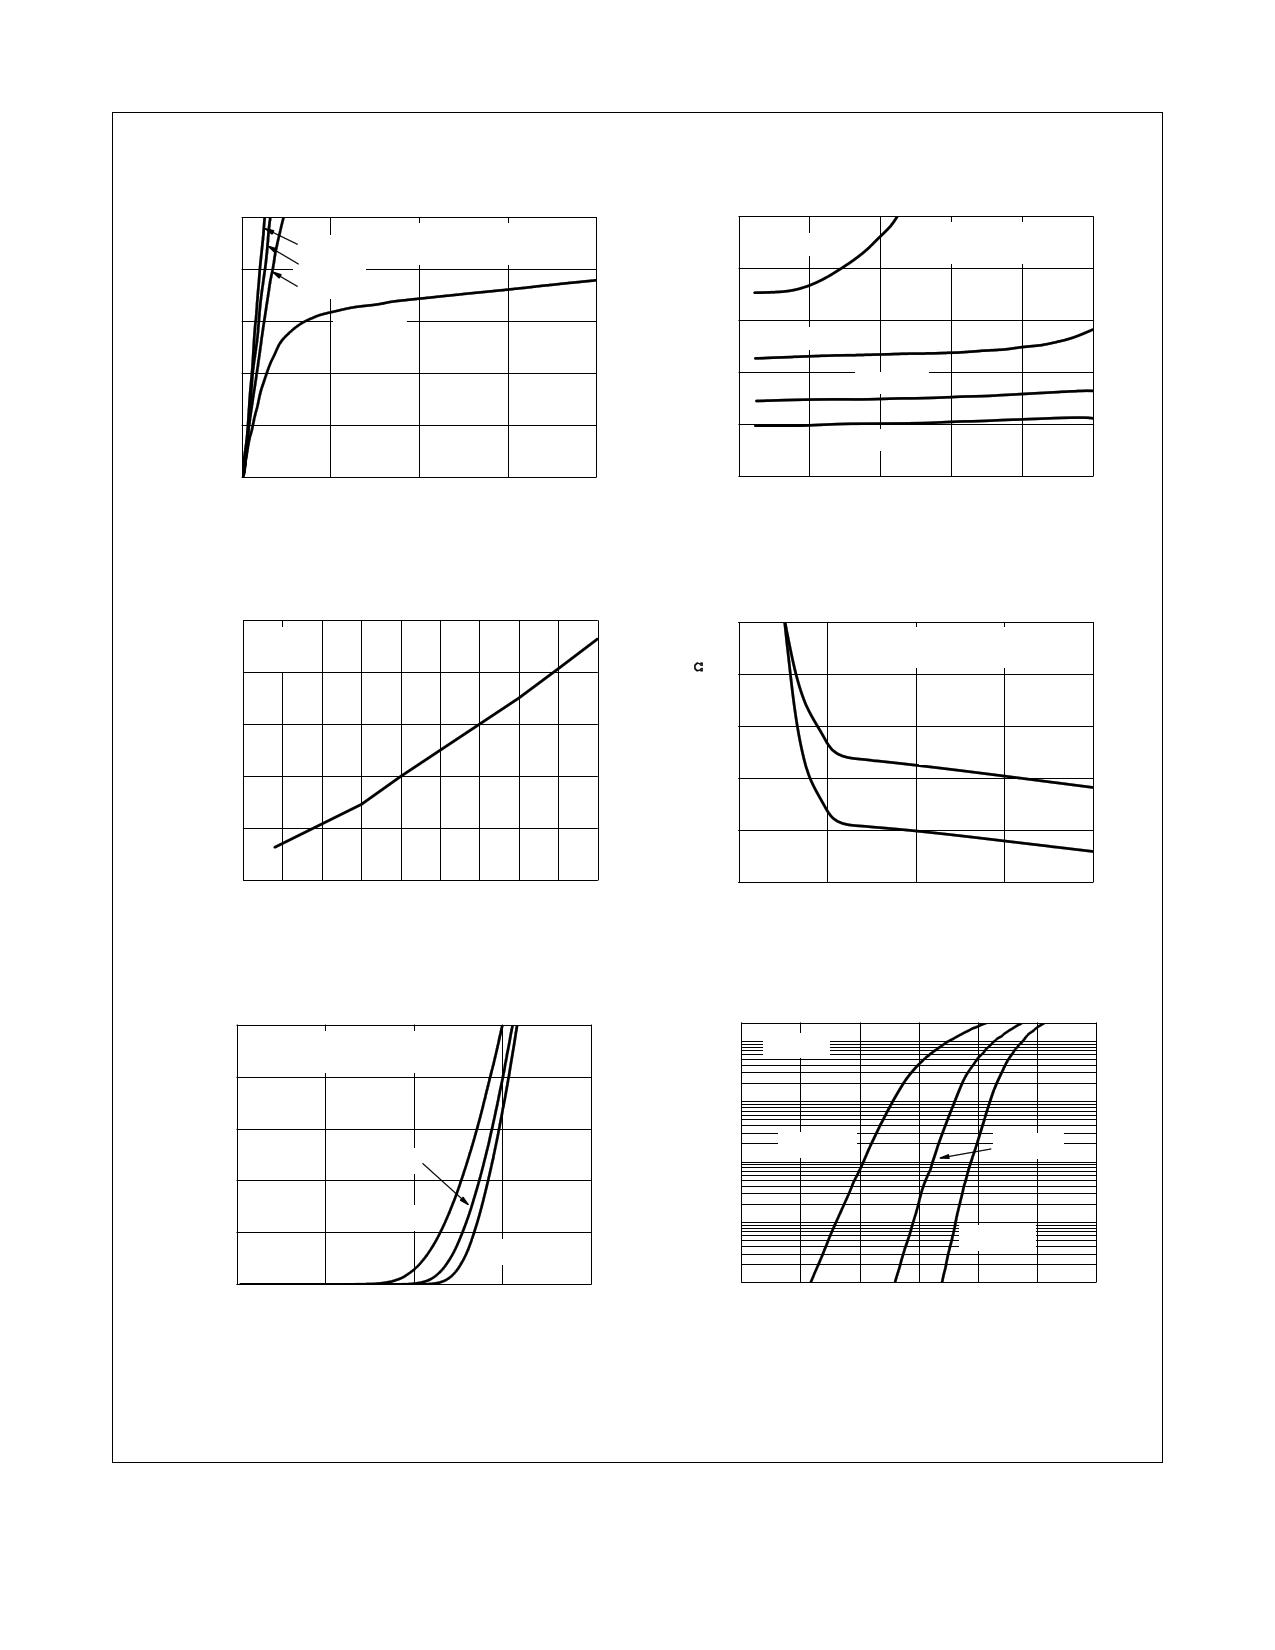 FDS8858CZ pdf, 반도체, 판매, 대치품